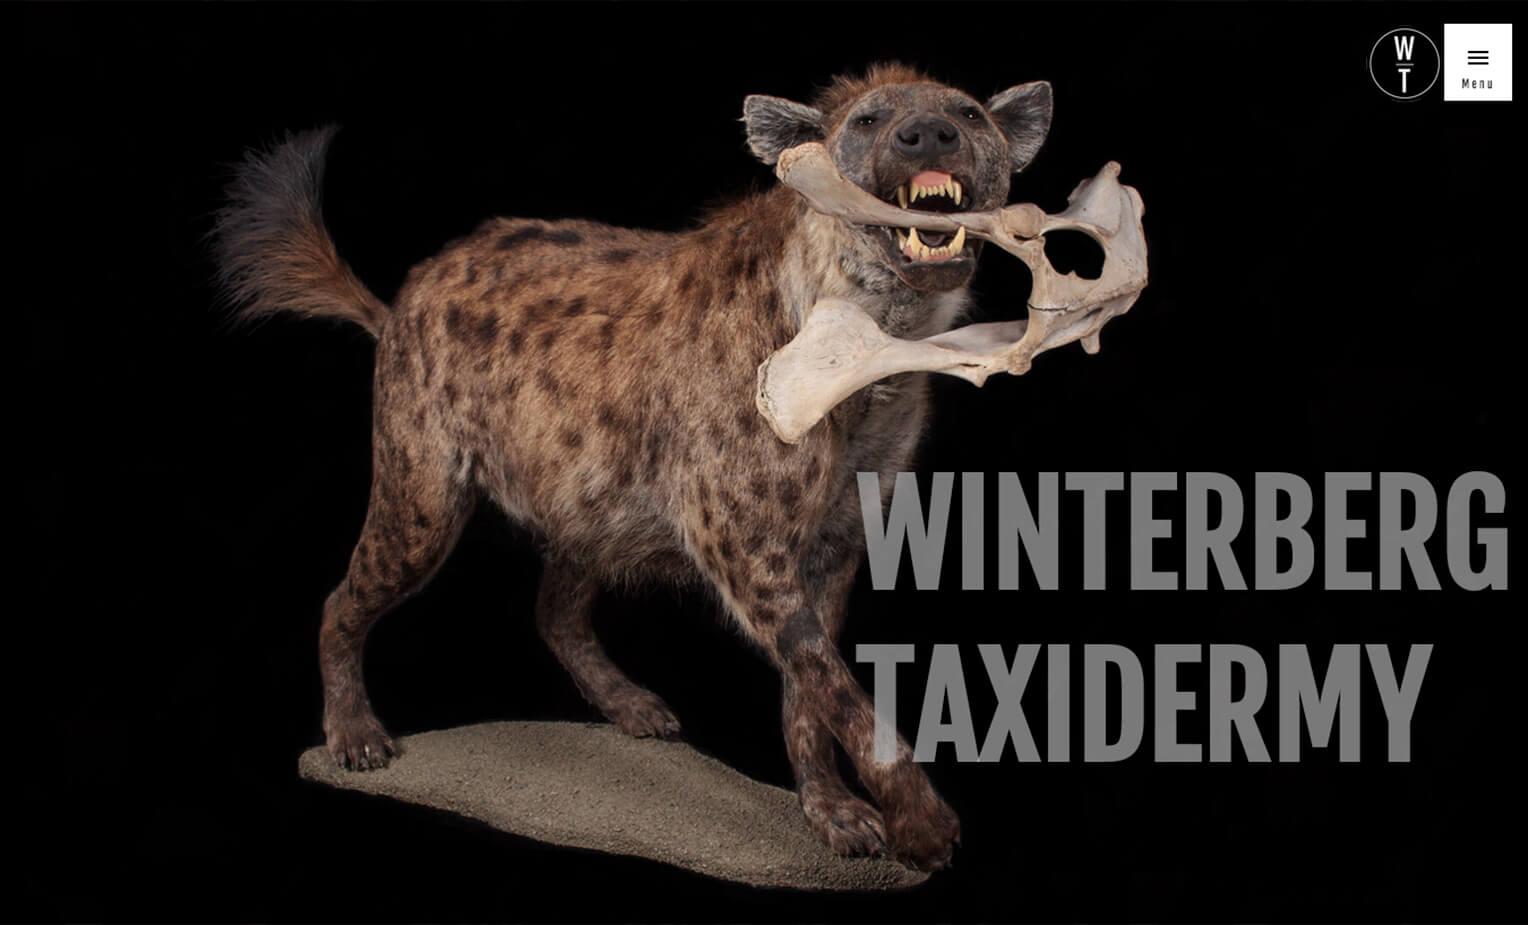 Winterberg Taxidermy